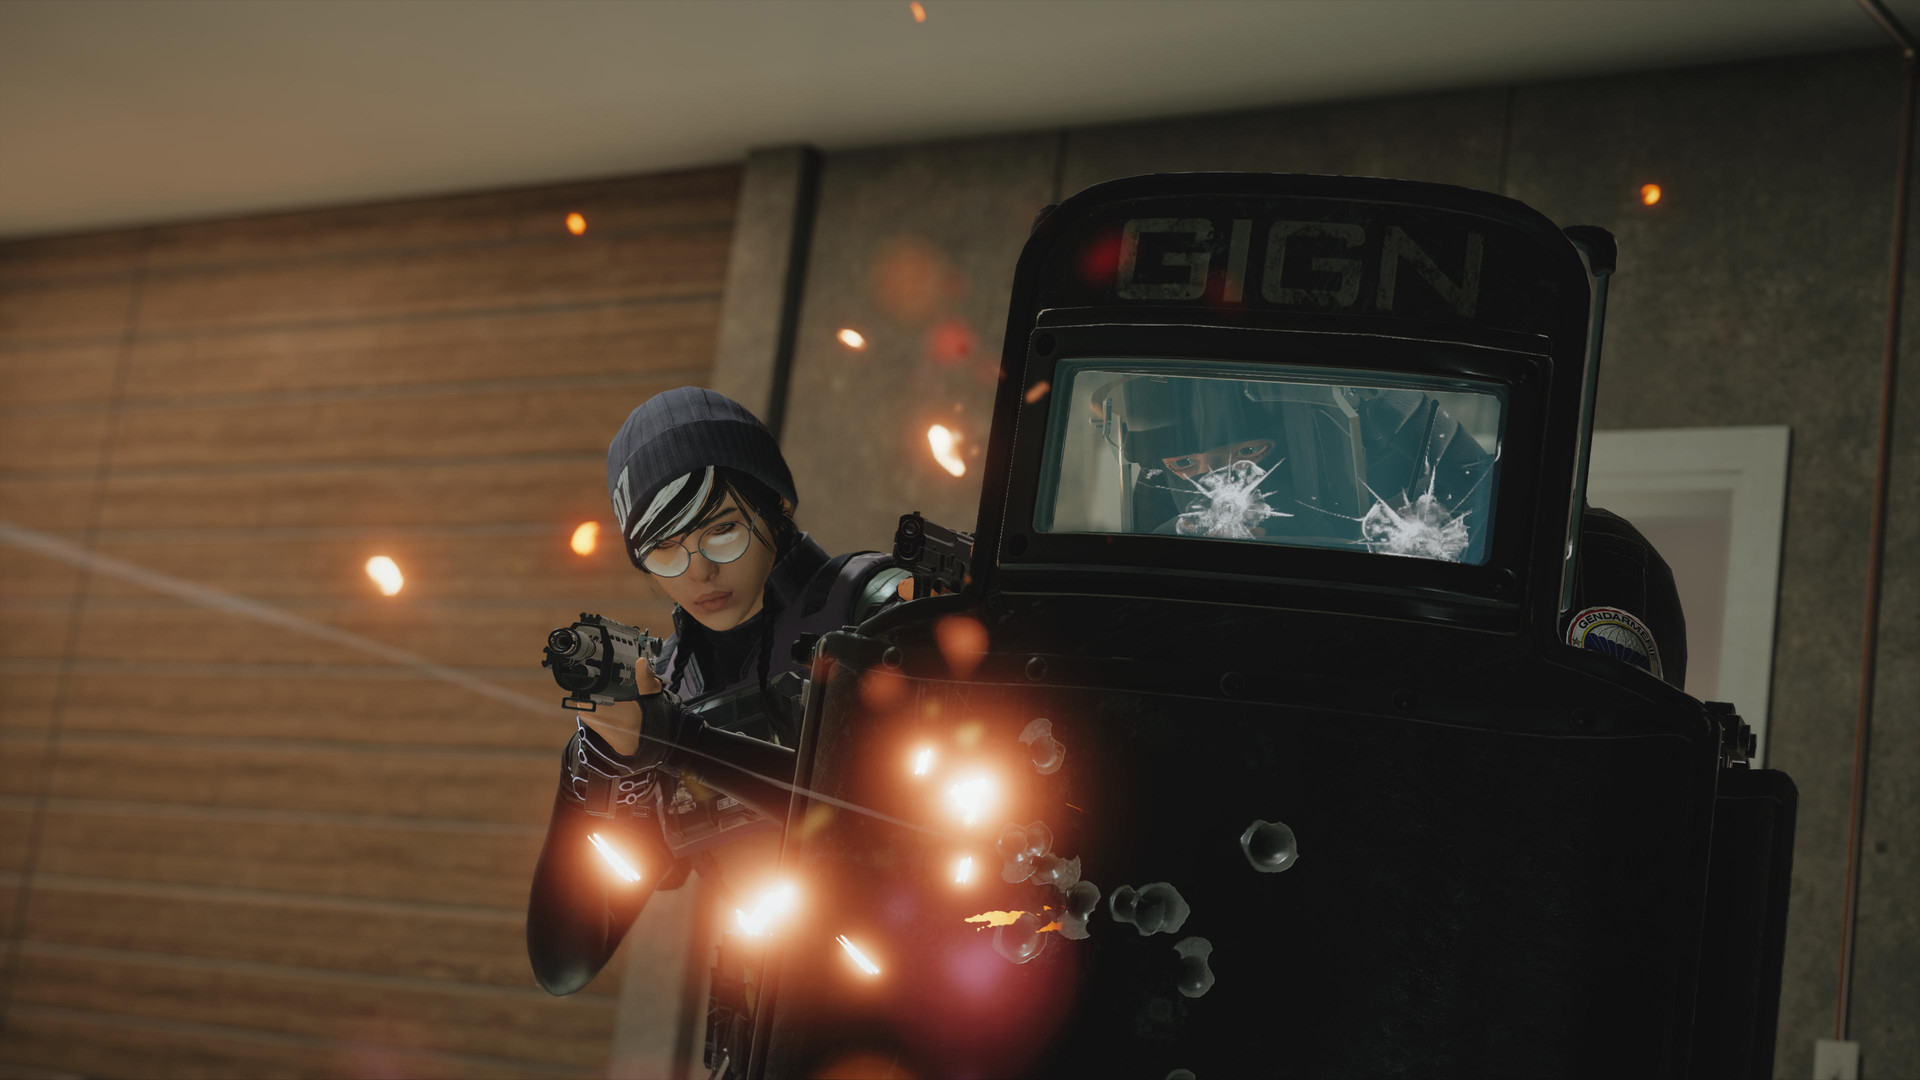 Ubisoft oslavuje IEM 2020. Rainbow Six Siege za PLN 32 na PC, 37 PLN na konzolách - hra bude pracovať na PS5 a XSX! 1